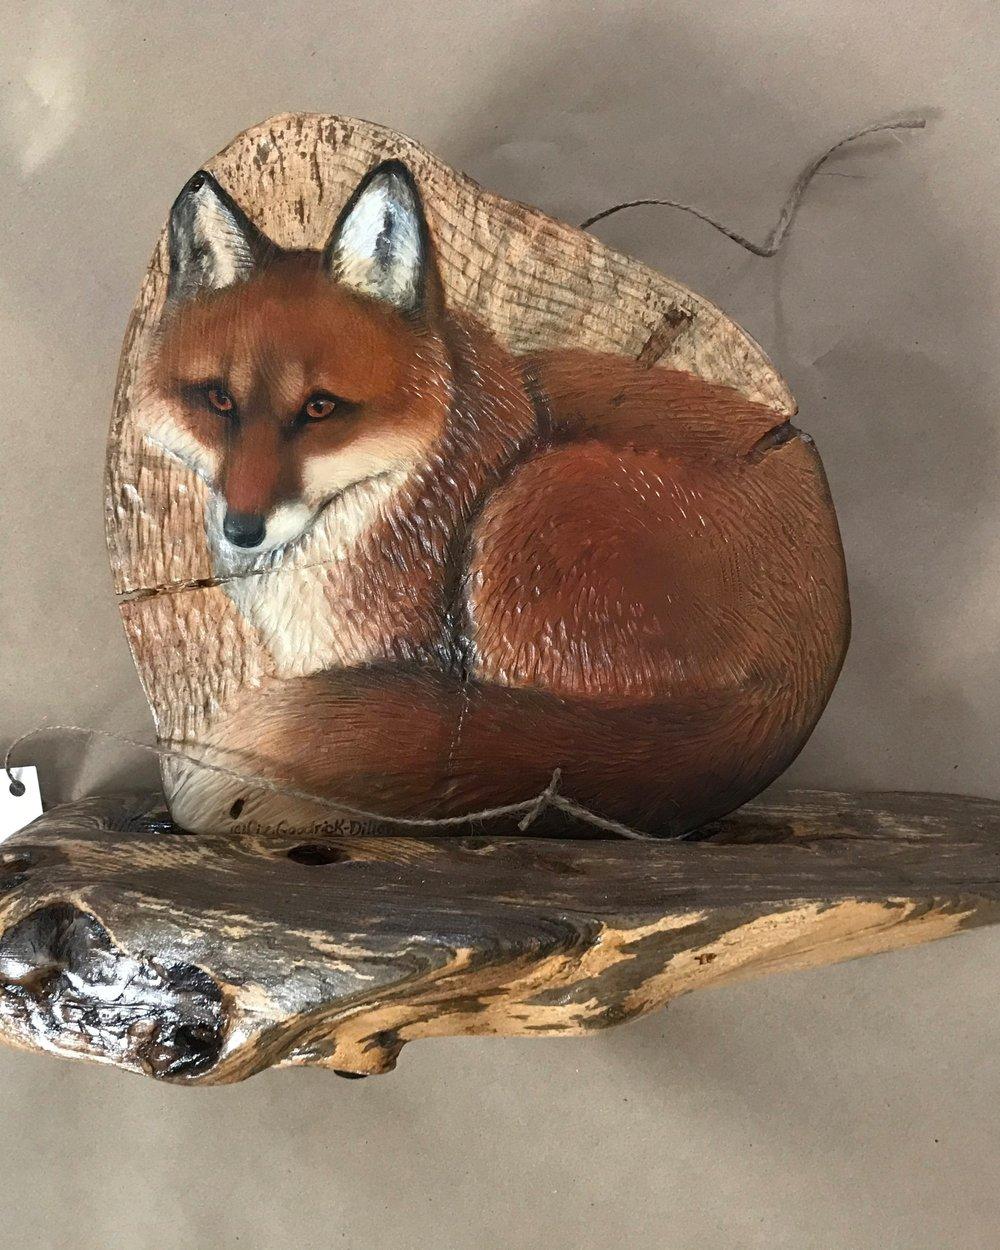 Red Fox on wood - by ©Liz Goodrick-Dillon